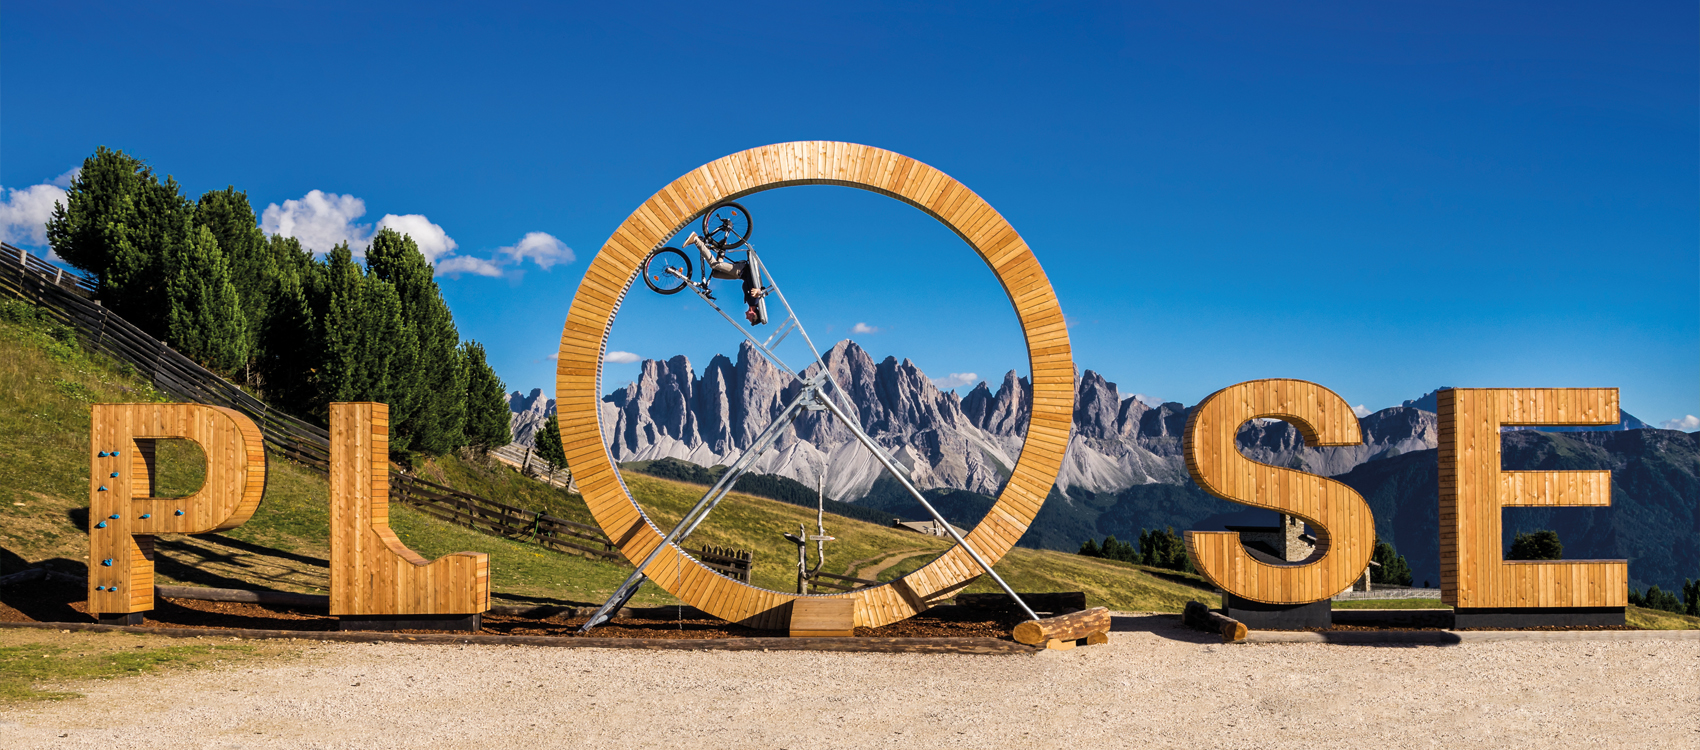 Plose- Bressanone-Alto Adige